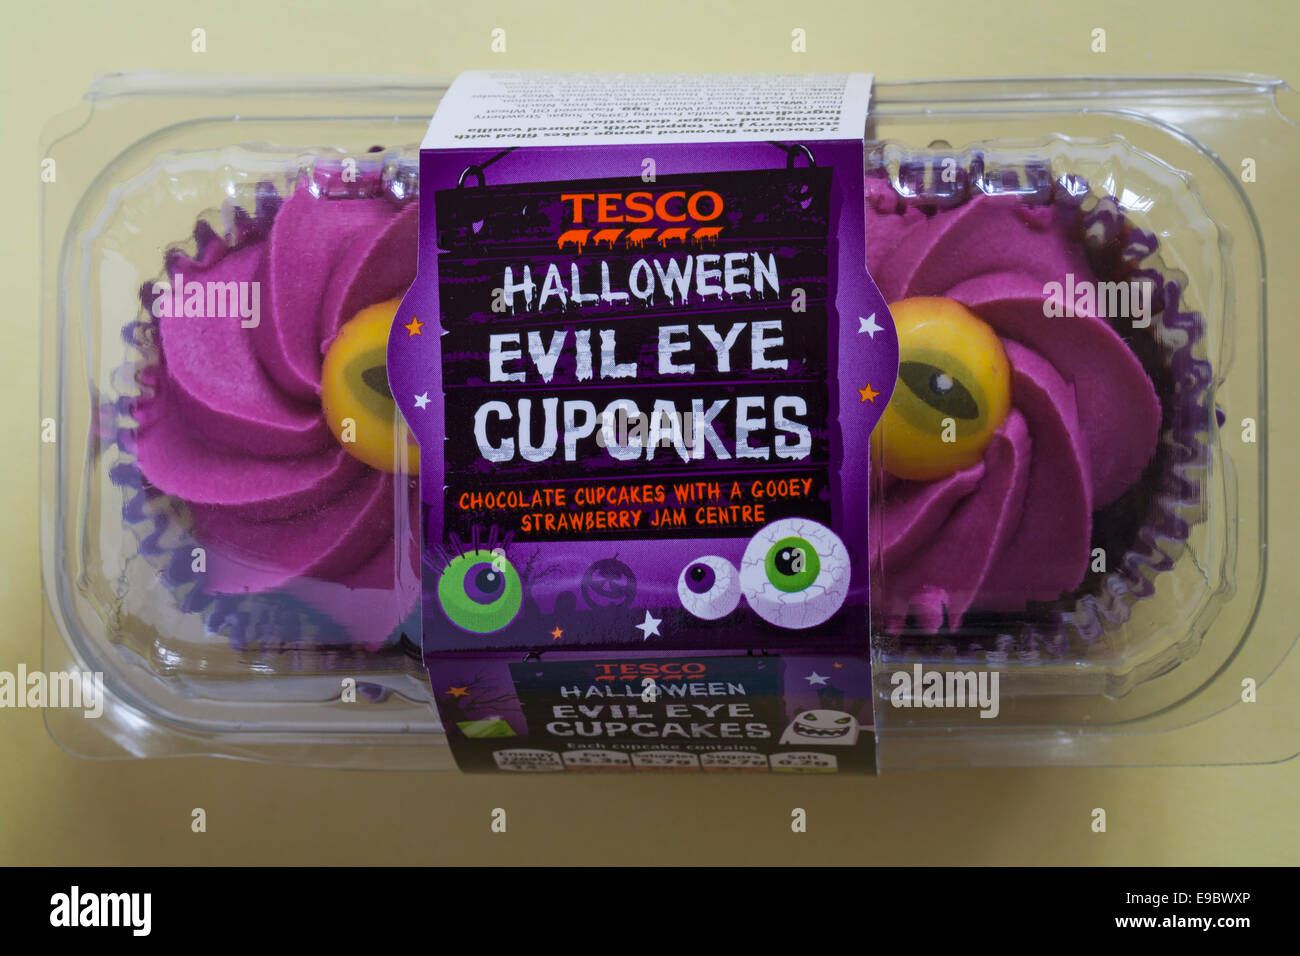 Tesco Halloween Cake Decoration : Packet of Tesco Halloween evil eye cupcakes - chocolate ...